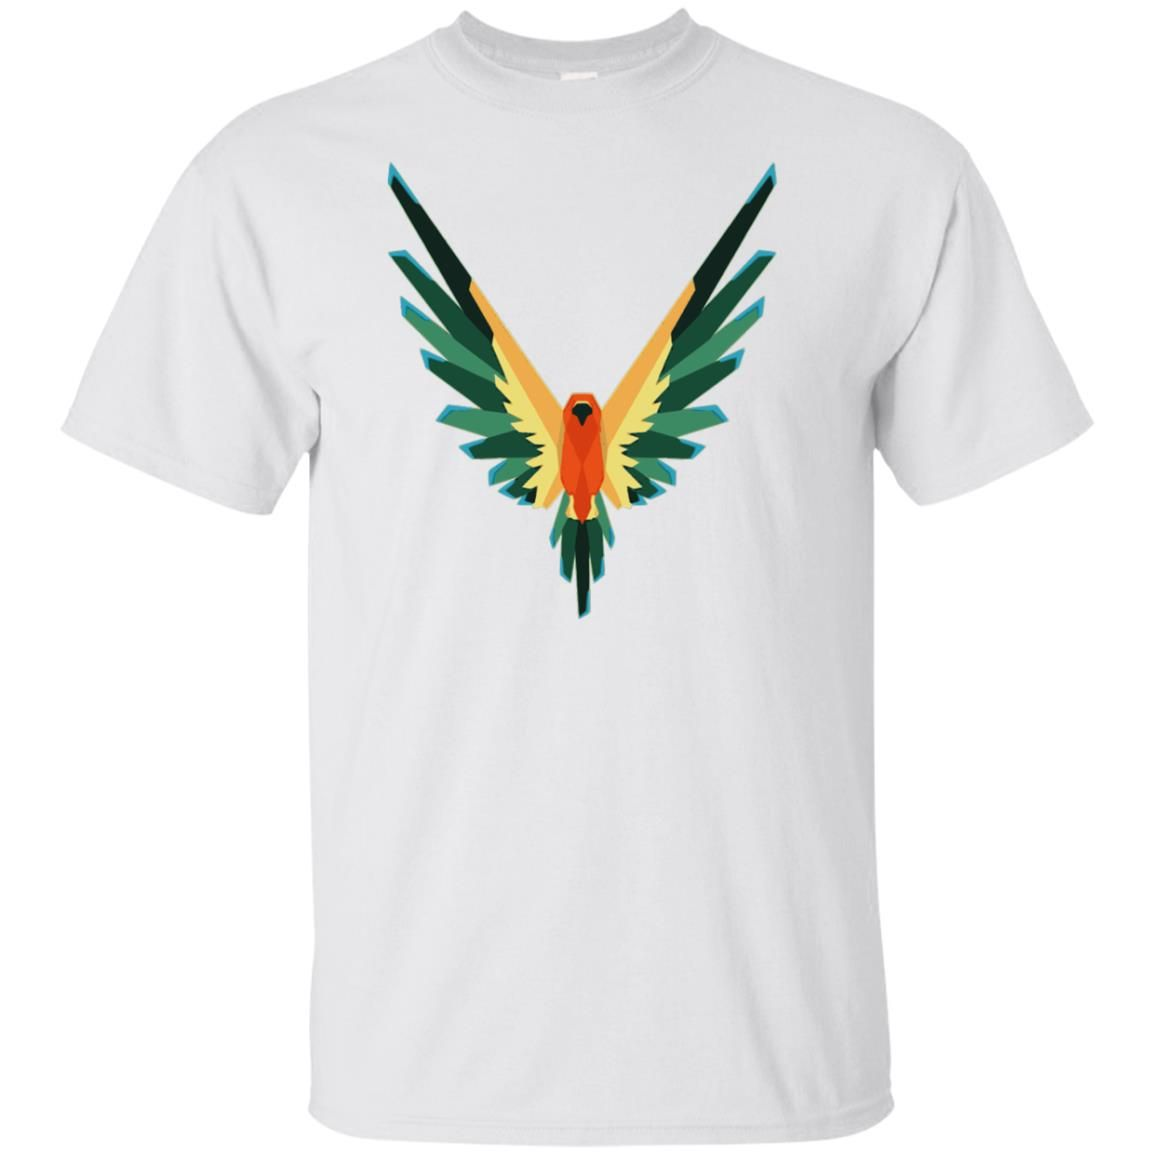 image 1236 - Logan Paul Maverick kid shirt & sweatshirt